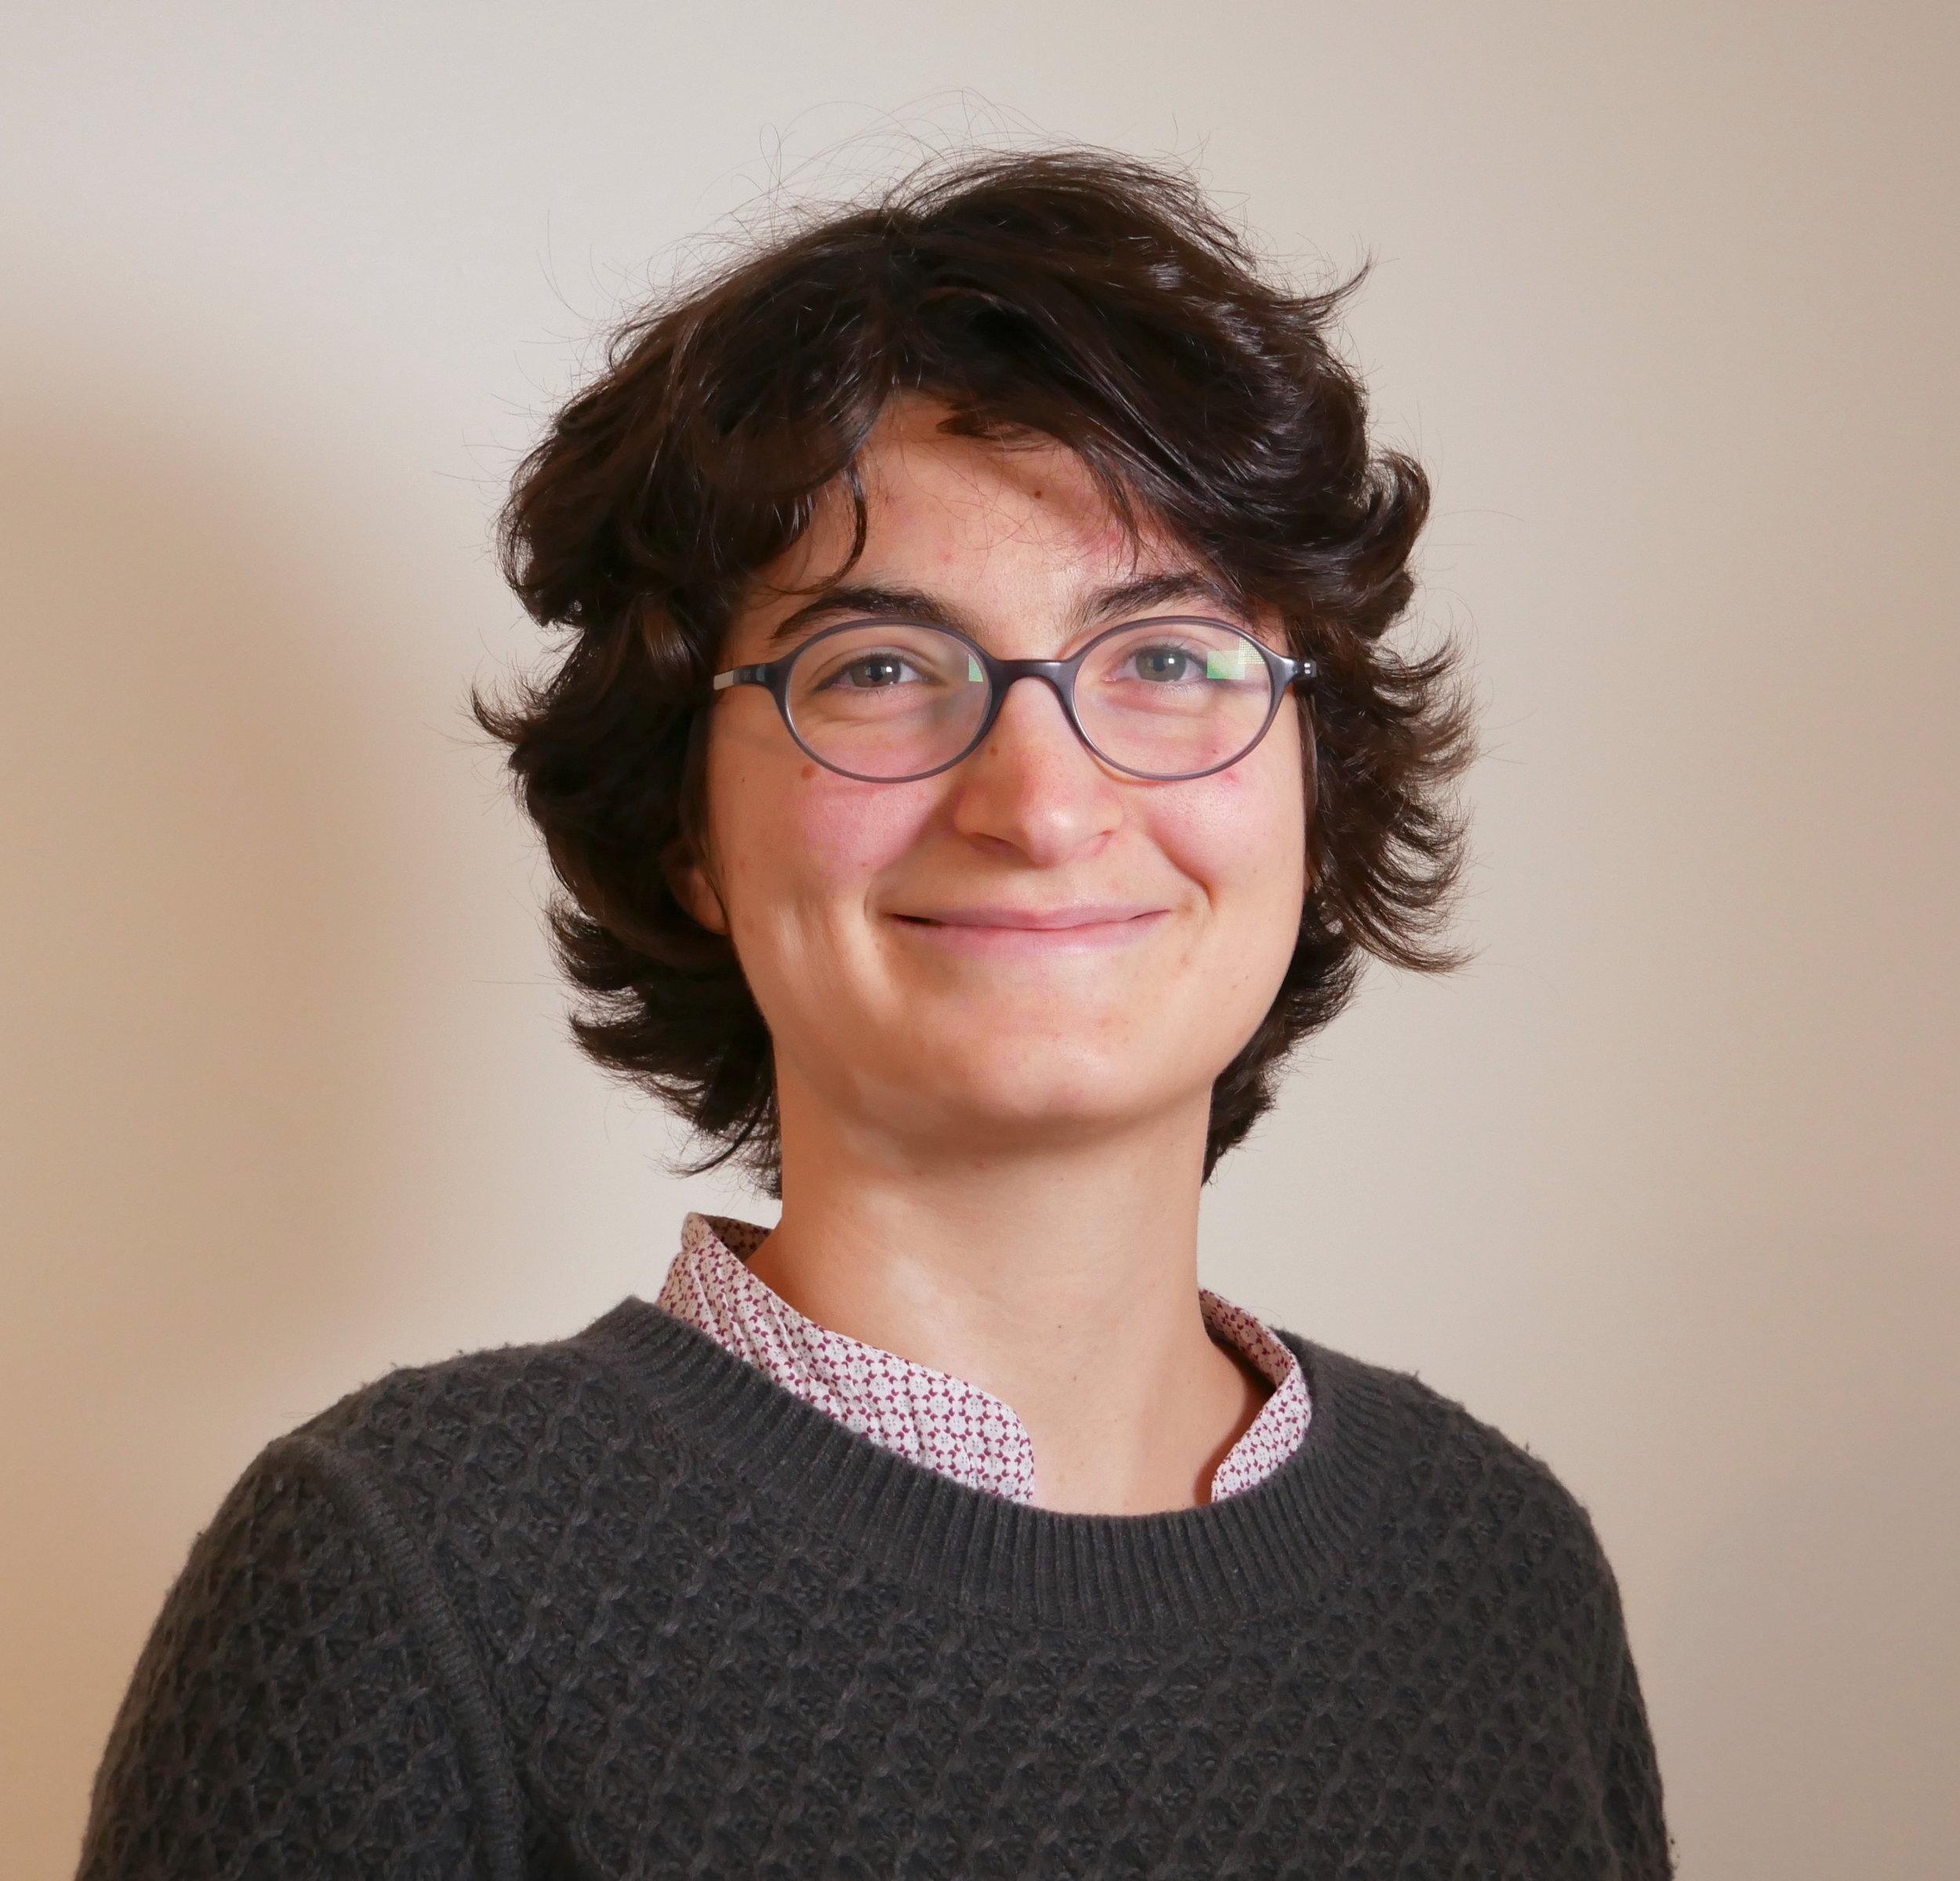 Chiara Naldi